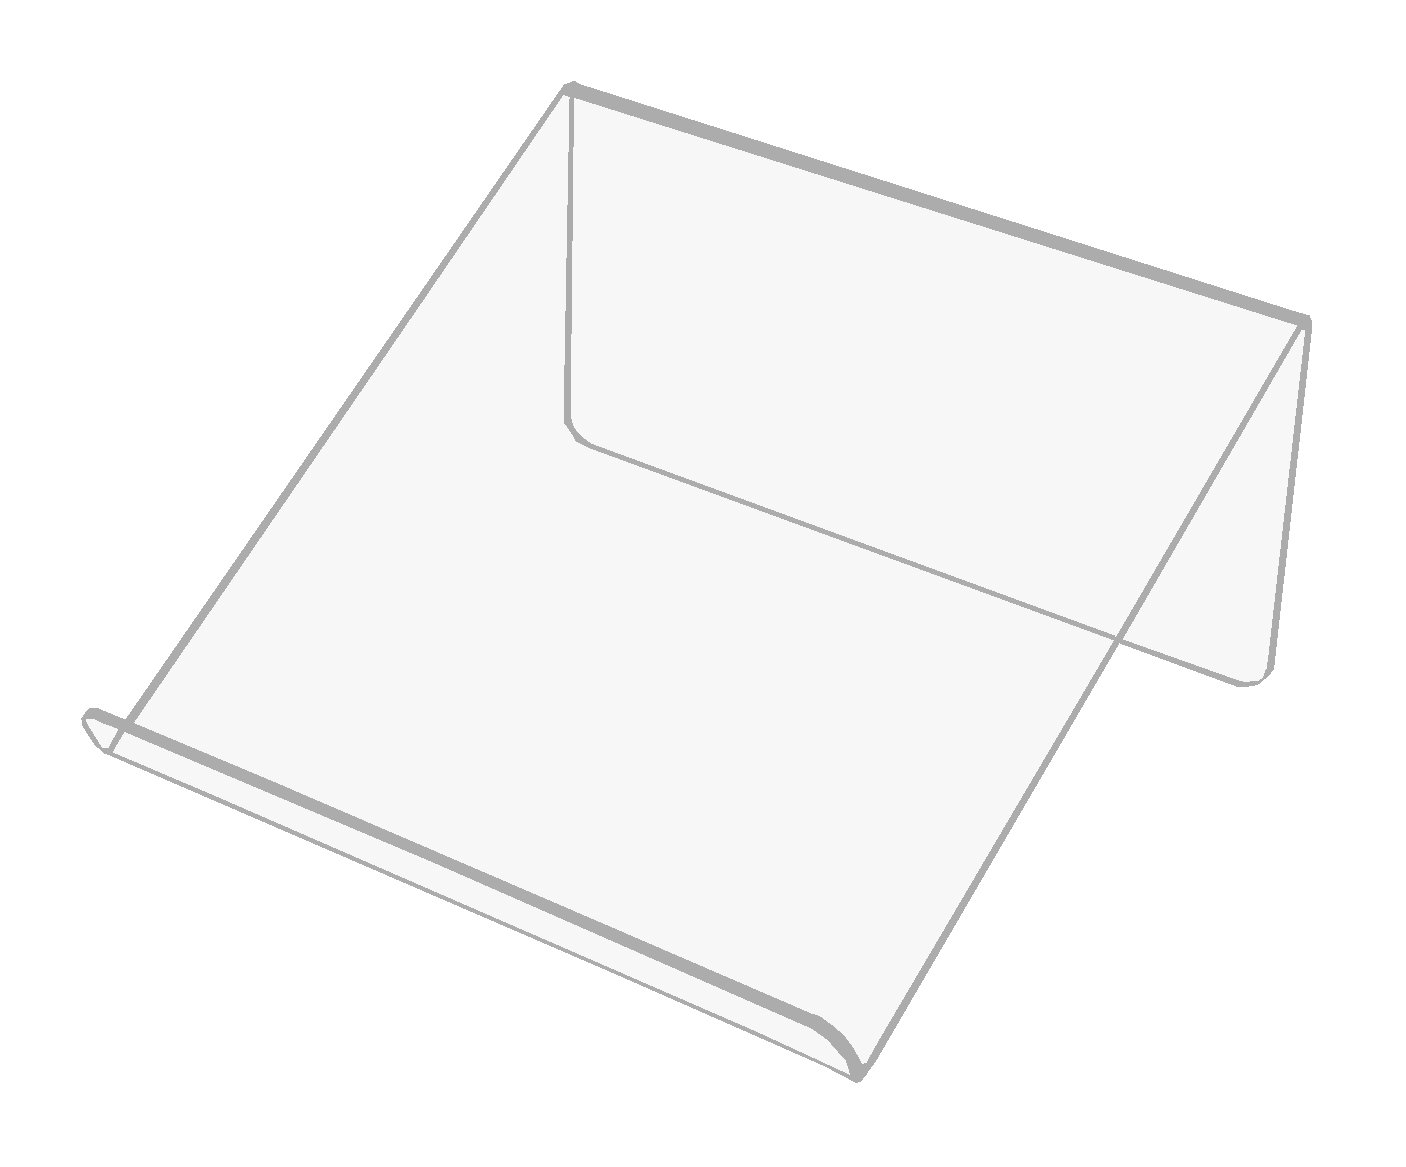 Stojan Stand 25cm Book notebooku s Plexiglass 3mm